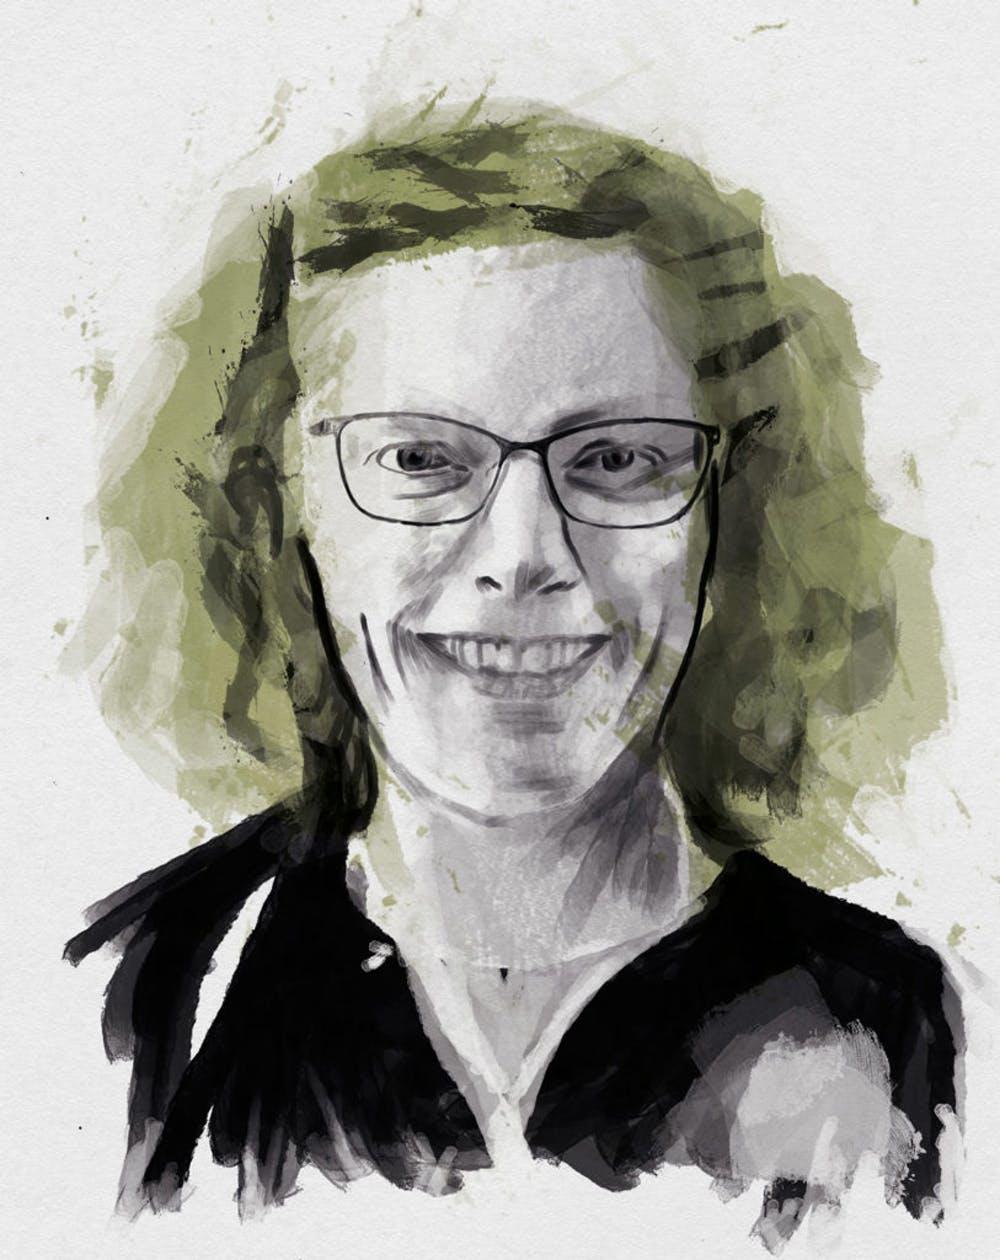 Anne Sverdrup-Thygeson retratada por Jeff Benefit. Telos